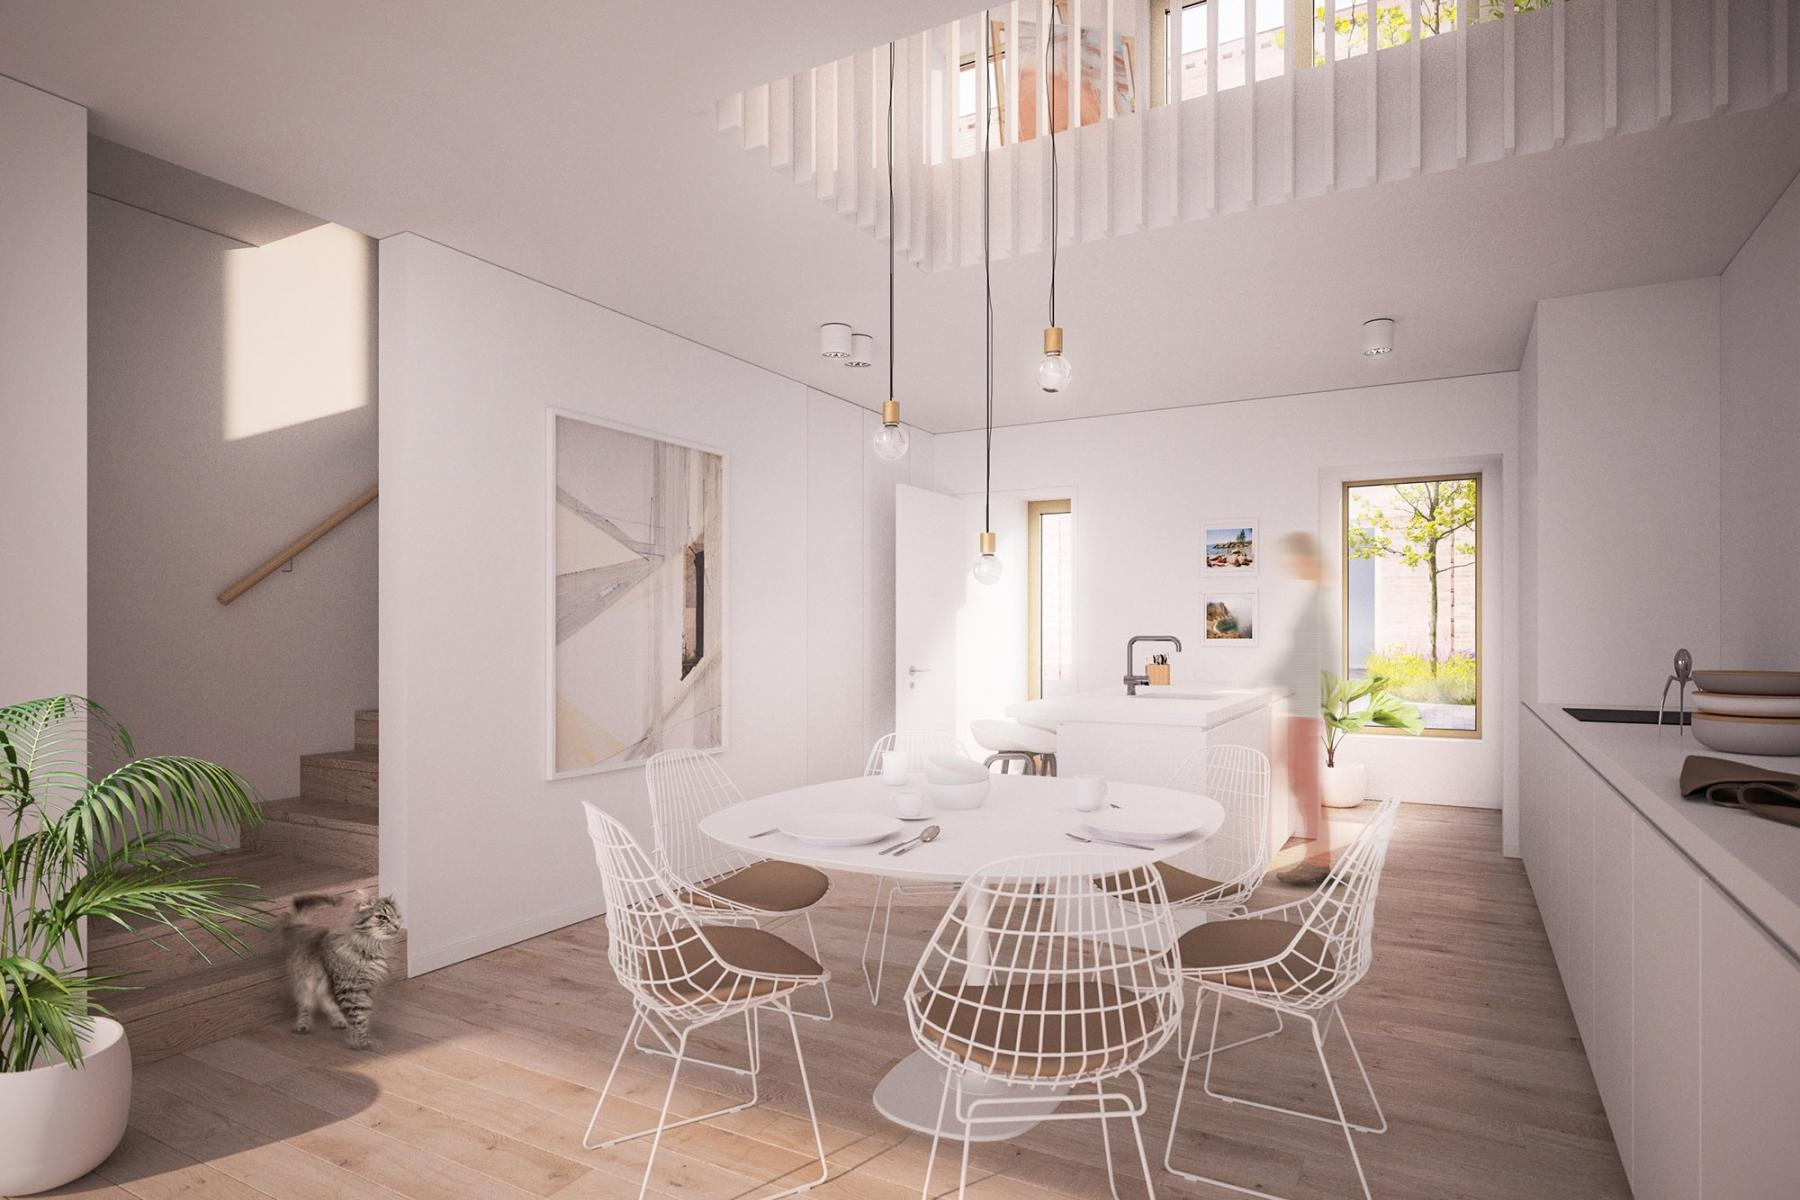 Revive Saffrou 2019 02 01 Beeld 08 Interieur Terraswoning